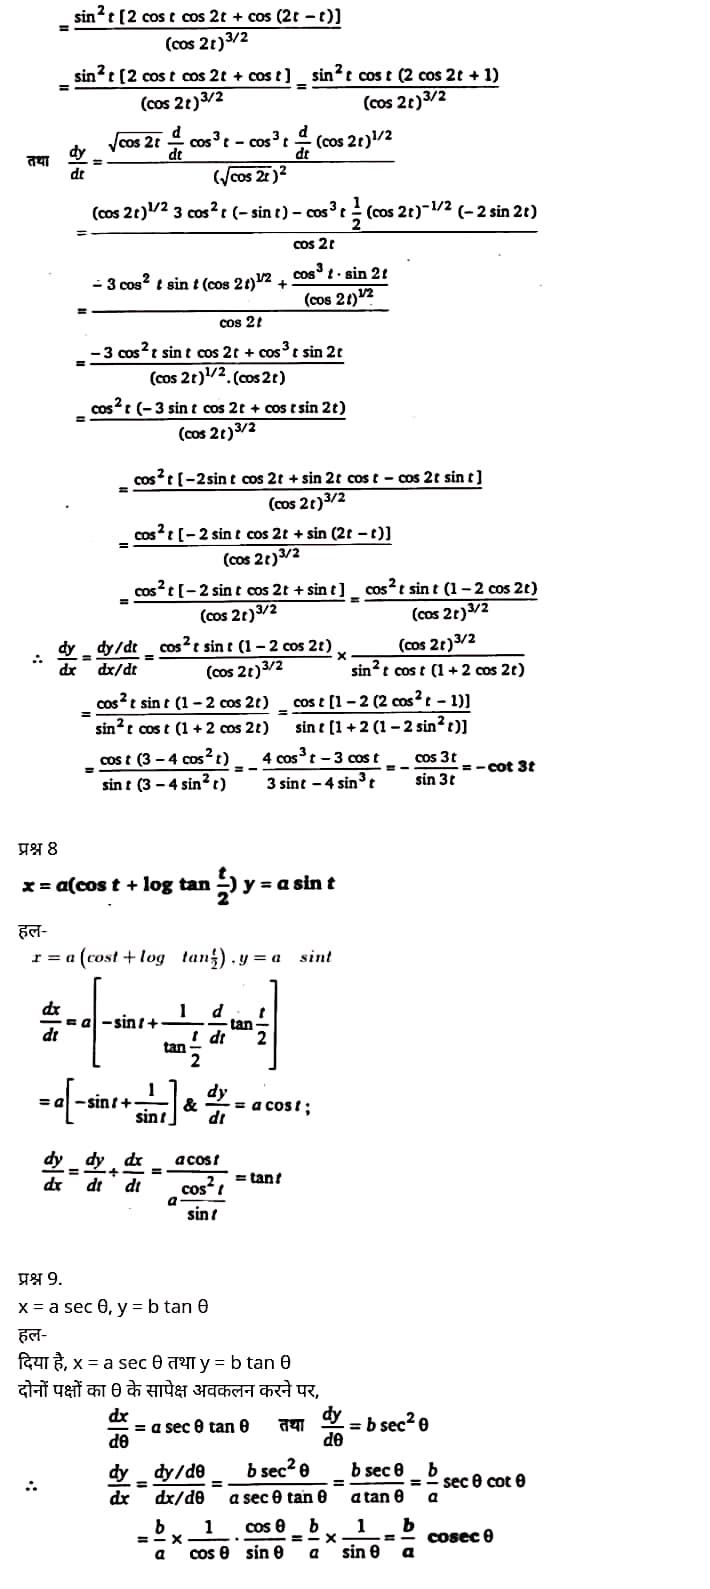 Class 12 Maths Chapter 5, Continuity and Differentiability Hindi Medium,  मैथ्स कक्षा 12 नोट्स pdf,  मैथ्स कक्षा 12 नोट्स 2020 NCERT,  मैथ्स कक्षा 12 PDF,  मैथ्स पुस्तक,  मैथ्स की बुक,  मैथ्स प्रश्नोत्तरी Class 12, 12 वीं मैथ्स पुस्तक RBSE,  बिहार बोर्ड 12 वीं मैथ्स नोट्स,   12th Maths book in hindi,12th Maths notes in hindi,cbse books for class 12,cbse books in hindi,cbse ncert books,class 12 Maths notes in hindi,class 12 hindi ncert solutions,Maths 2020,Maths 2021,Maths 2022,Maths book class 12,Maths book in hindi,Maths class 12 in hindi,Maths notes for class 12 up board in hindi,ncert all books,ncert app in hindi,ncert book solution,ncert books class 10,ncert books class 12,ncert books for class 7,ncert books for upsc in hindi,ncert books in hindi class 10,ncert books in hindi for class 12 Maths,ncert books in hindi for class 6,ncert books in hindi pdf,ncert class 12 hindi book,ncert english book,ncert Maths book in hindi,ncert Maths books in hindi pdf,ncert Maths class 12,ncert in hindi,old ncert books in hindi,online ncert books in hindi,up board 12th,up board 12th syllabus,up board class 10 hindi book,up board class 12 books,up board class 12 new syllabus,up Board Maths 2020,up Board Maths 2021,up Board Maths 2022,up Board Maths 2023,up board intermediate Maths syllabus,up board intermediate syllabus 2021,Up board Master 2021,up board model paper 2021,up board model paper all subject,up board new syllabus of class 12th Maths,up board paper 2021,Up board syllabus 2021,UP board syllabus 2022,  12 veen maiths buk hindee mein, 12 veen maiths nots hindee mein, seebeeesasee kitaaben 12 ke lie, seebeeesasee kitaaben hindee mein, seebeeesasee enaseeaaratee kitaaben, klaas 12 maiths nots in hindee, klaas 12 hindee enaseeteeaar solyooshans, maiths 2020, maiths 2021, maiths 2022, maiths buk klaas 12, maiths buk in hindee, maiths klaas 12 hindee mein, maiths nots phor klaas 12 ap bord in hindee, nchairt all books, nchairt app in hindi, nchairt book solution, nchairt books